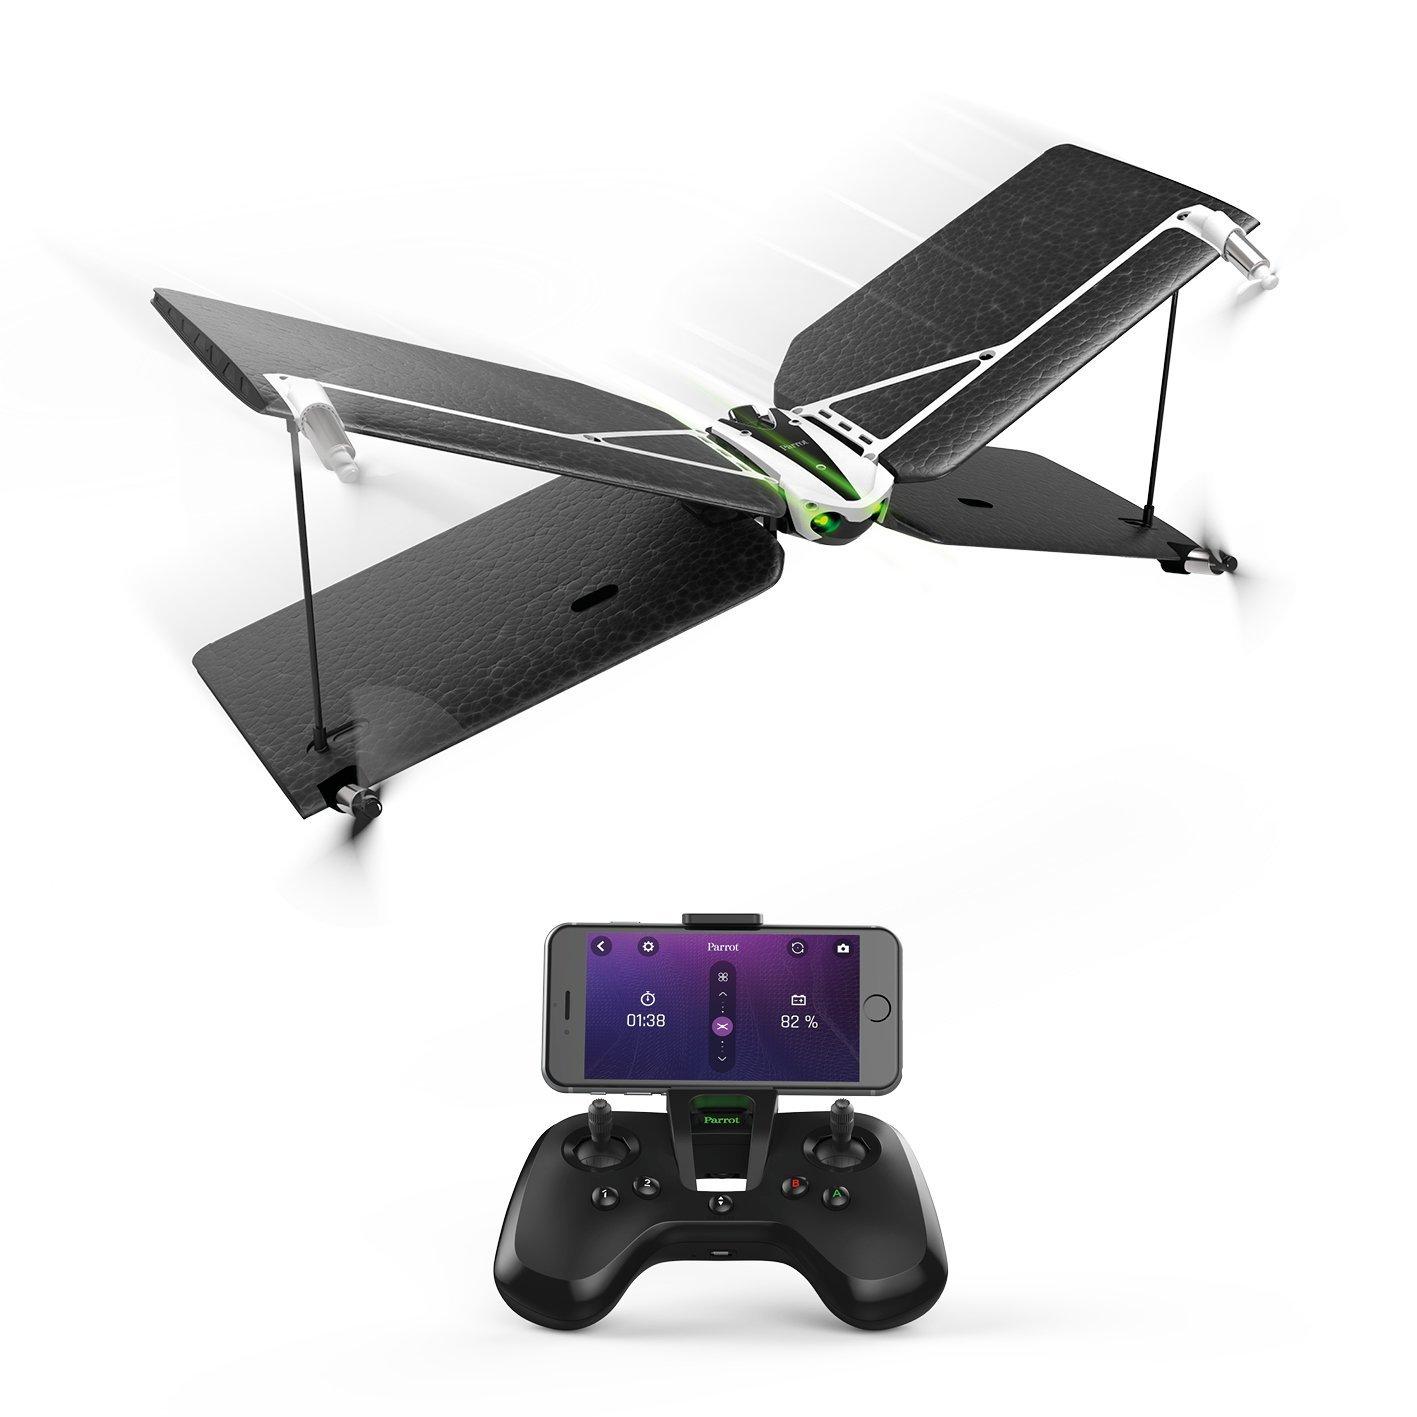 Parrot Minidrone amazon Swing + Flypad